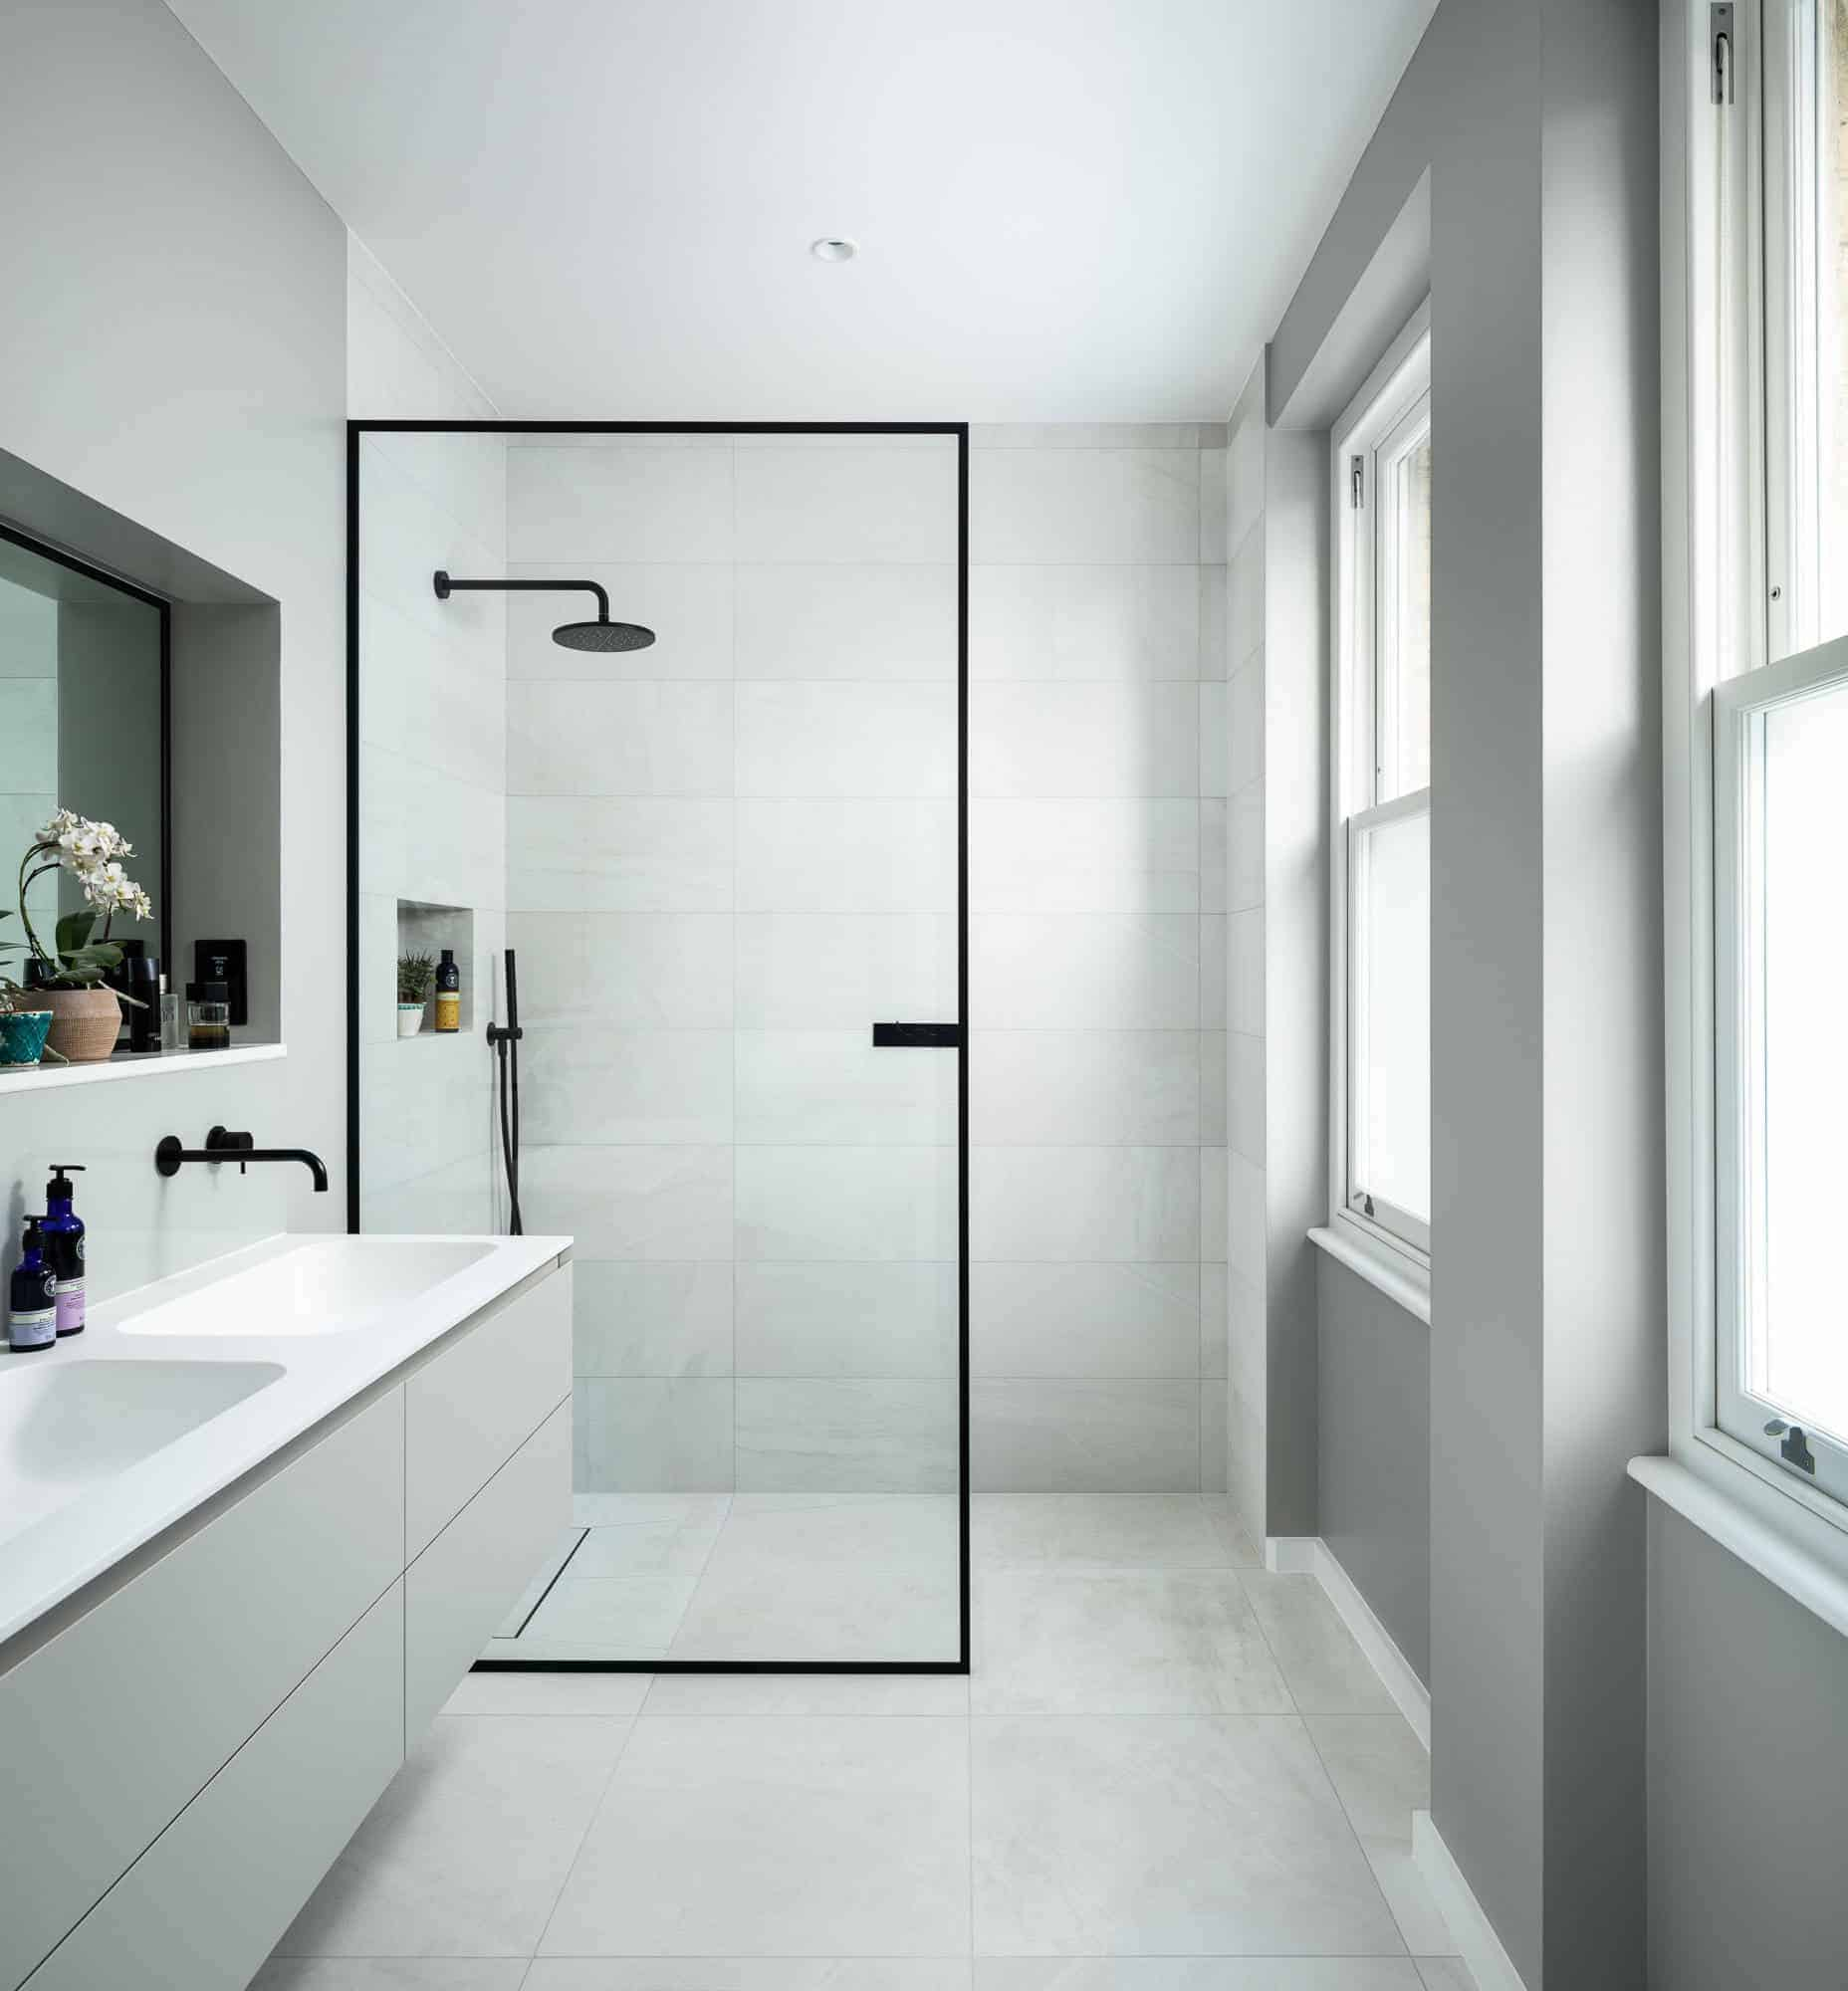 Minimalist Single Panel Doorless Shower